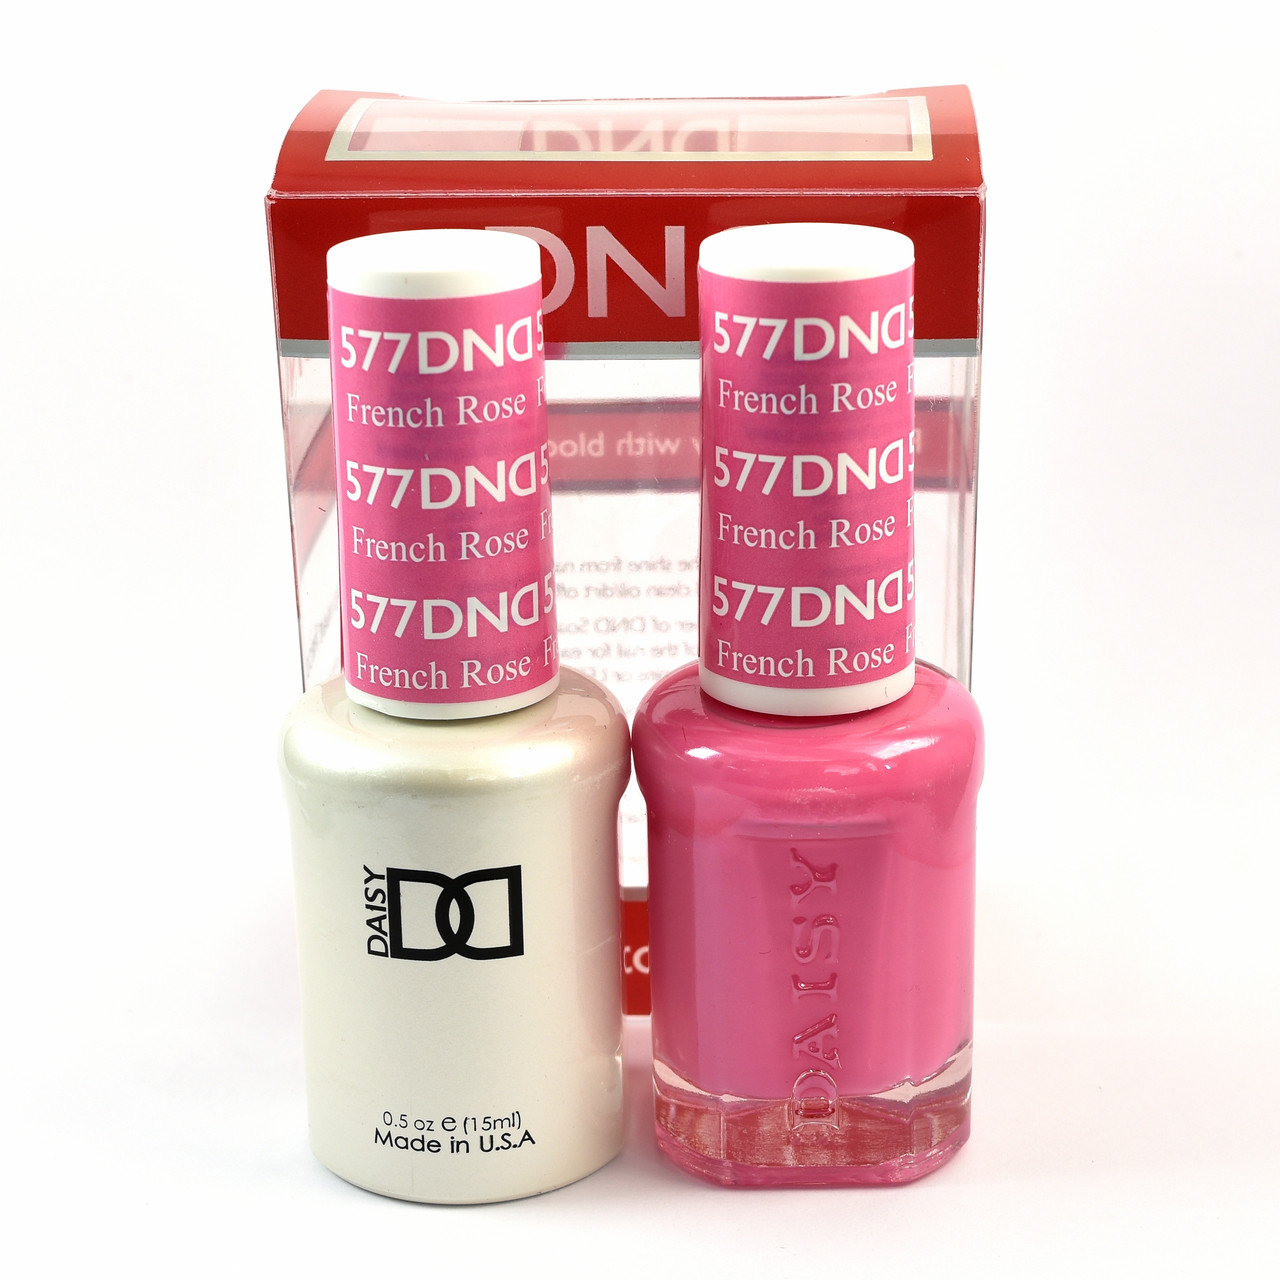 Daisy DND Duo GEL + MATCHING Nail Polish 577